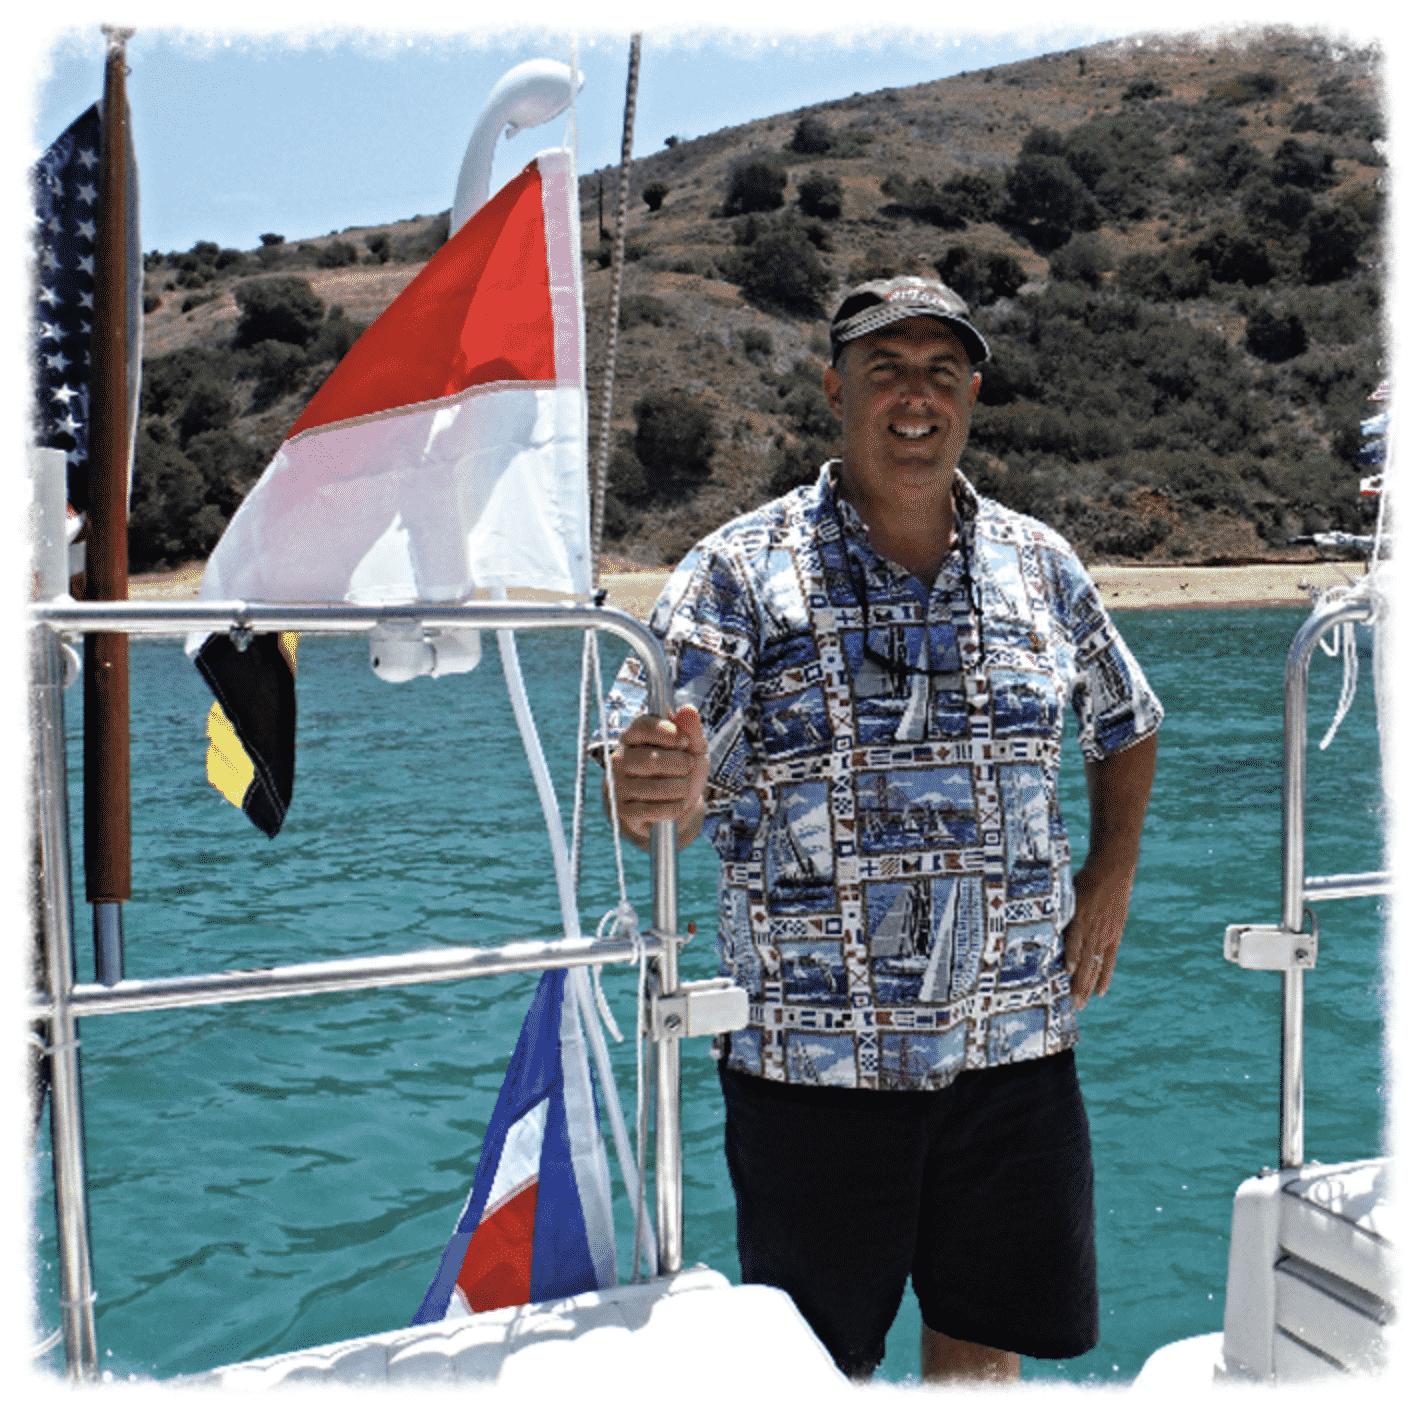 Prince Chater Captain Doug